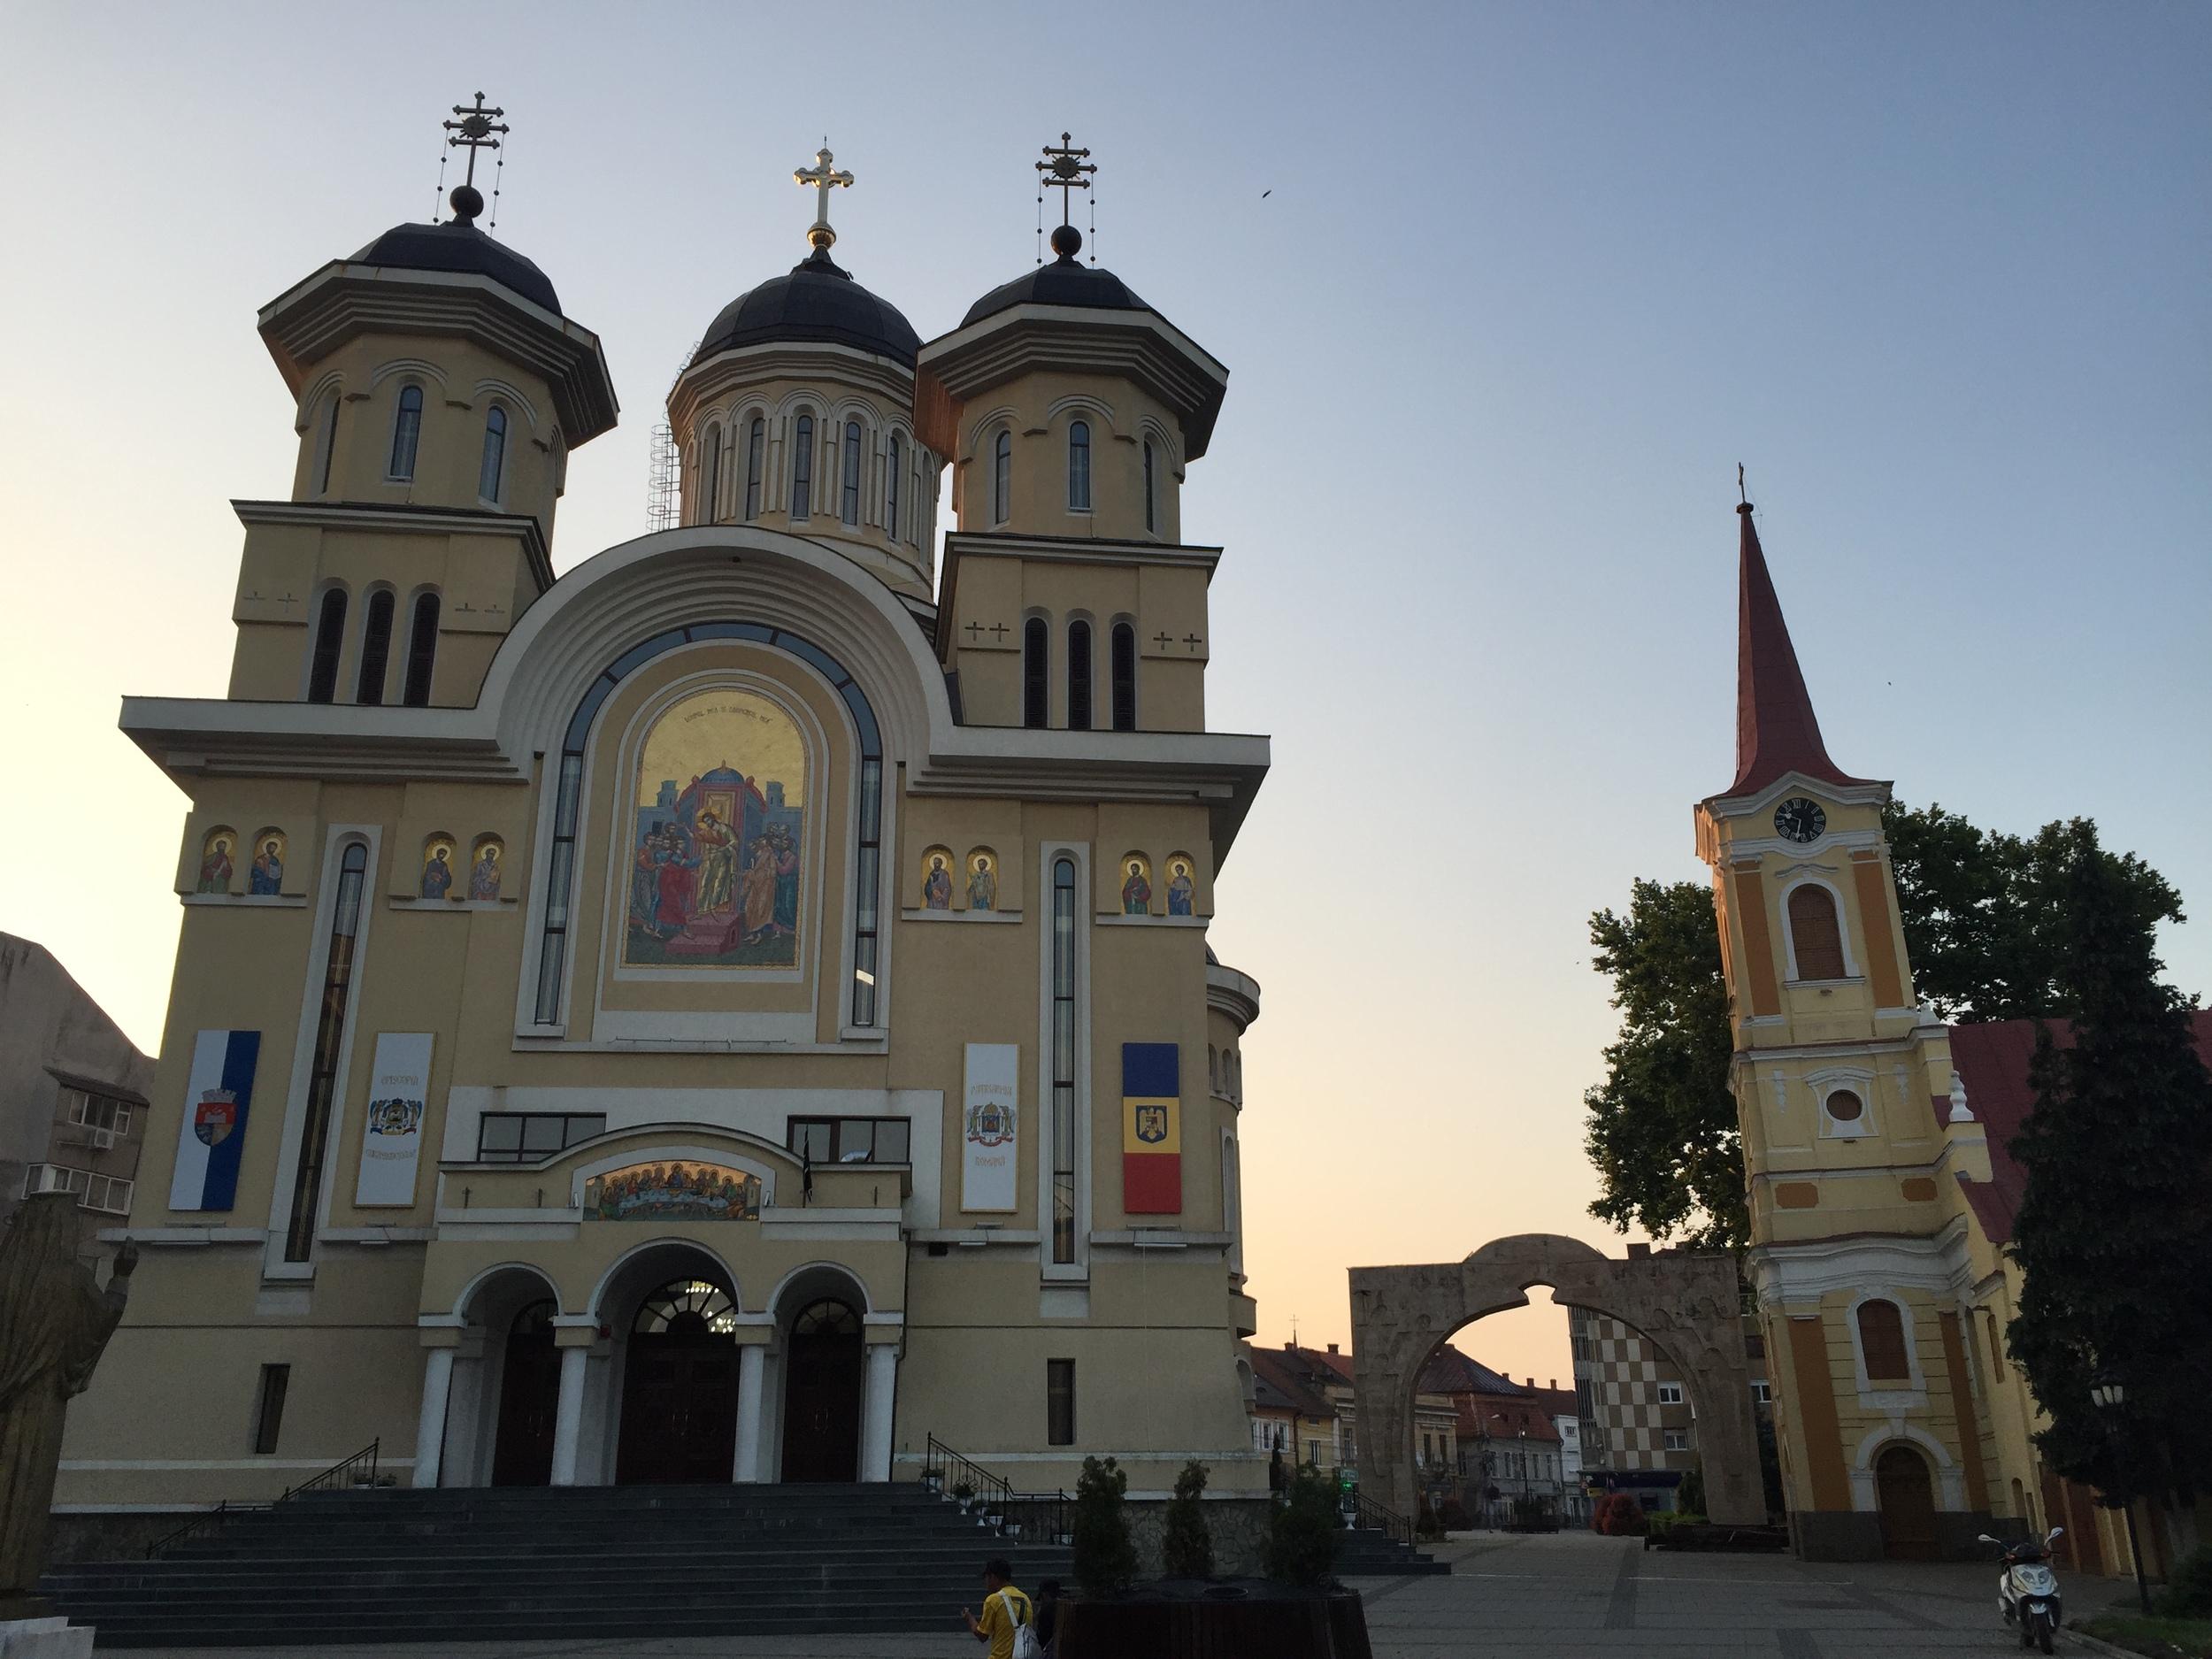 The main church in Caransebes.